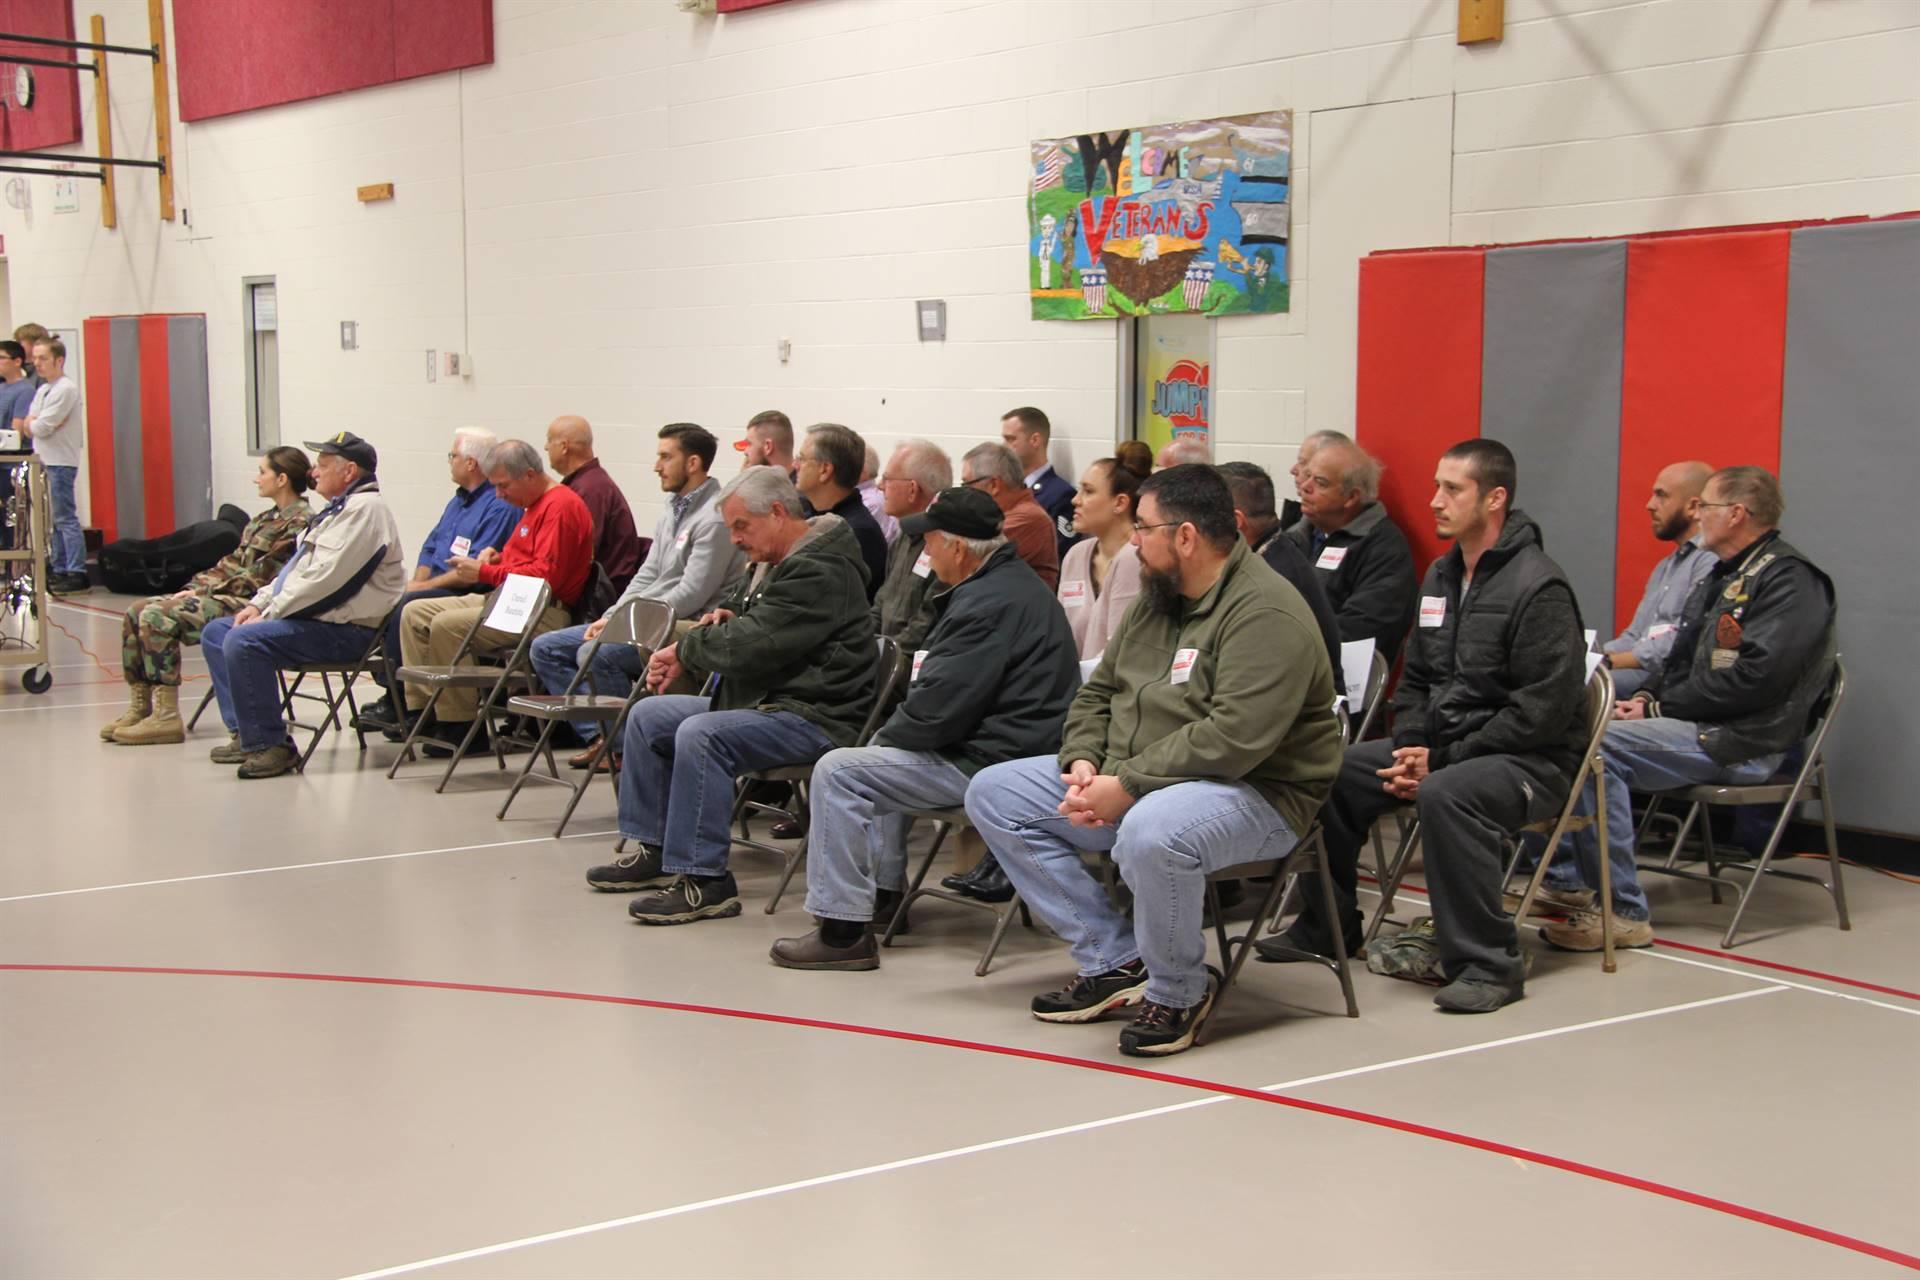 veterans listening to children read patriotic poem